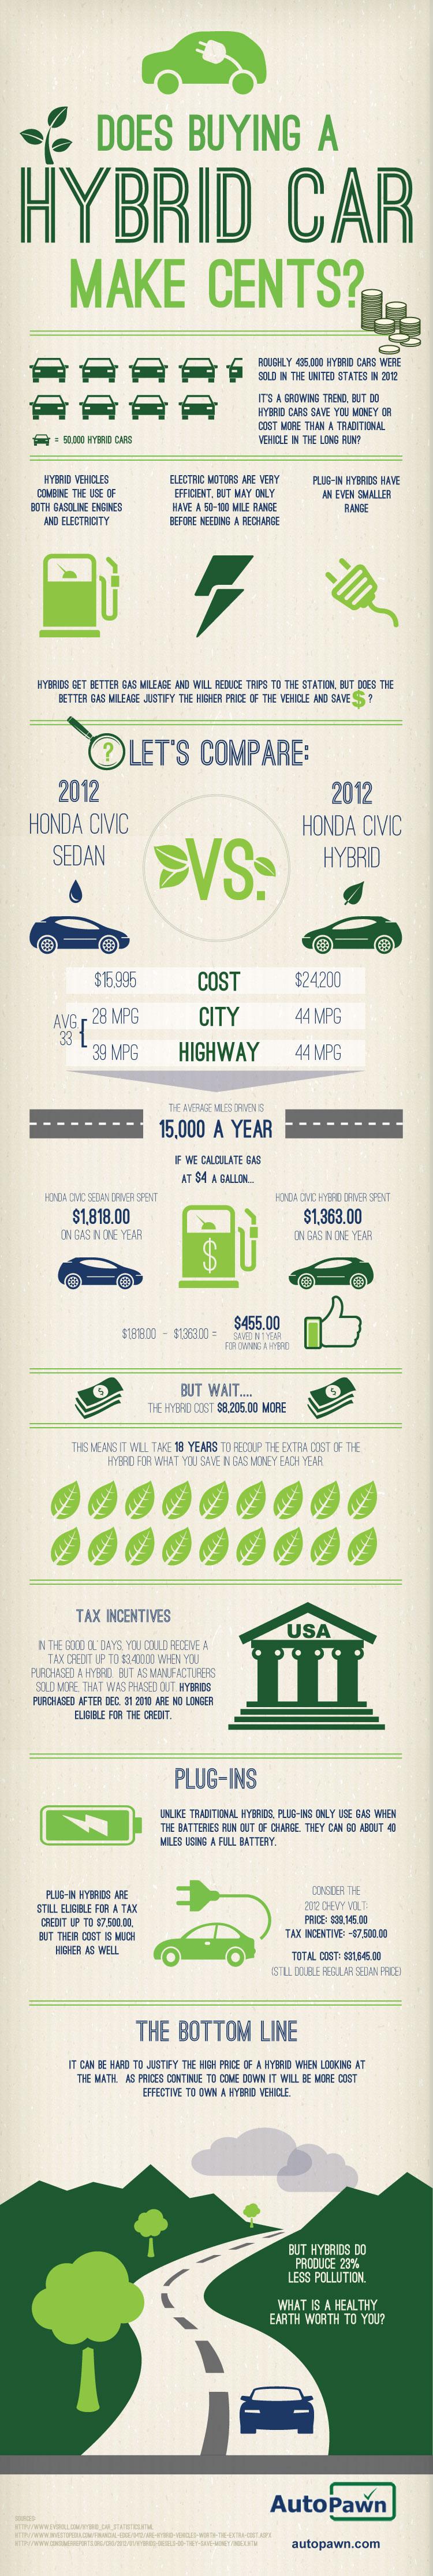 Hybrid Cars Trends